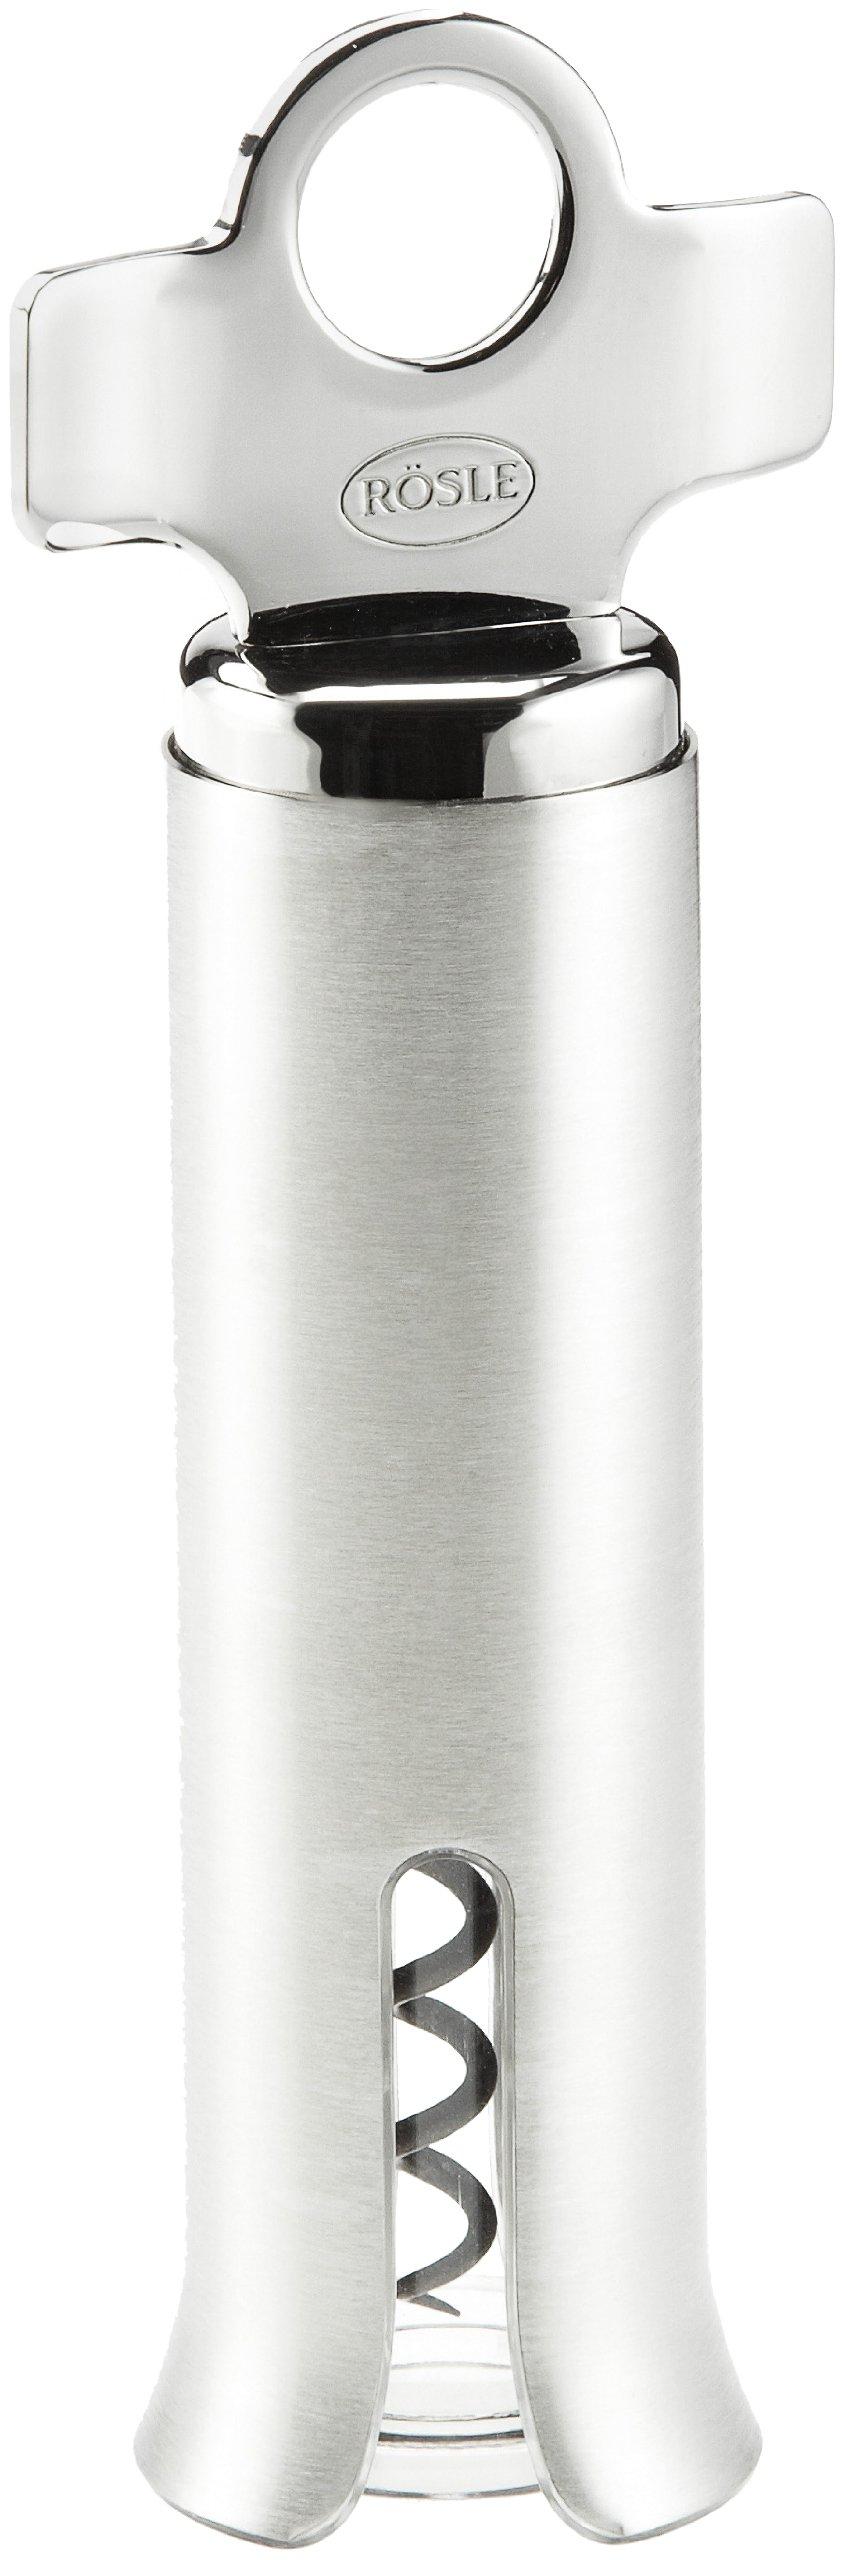 Rösle Stainless Steel Corkscrew